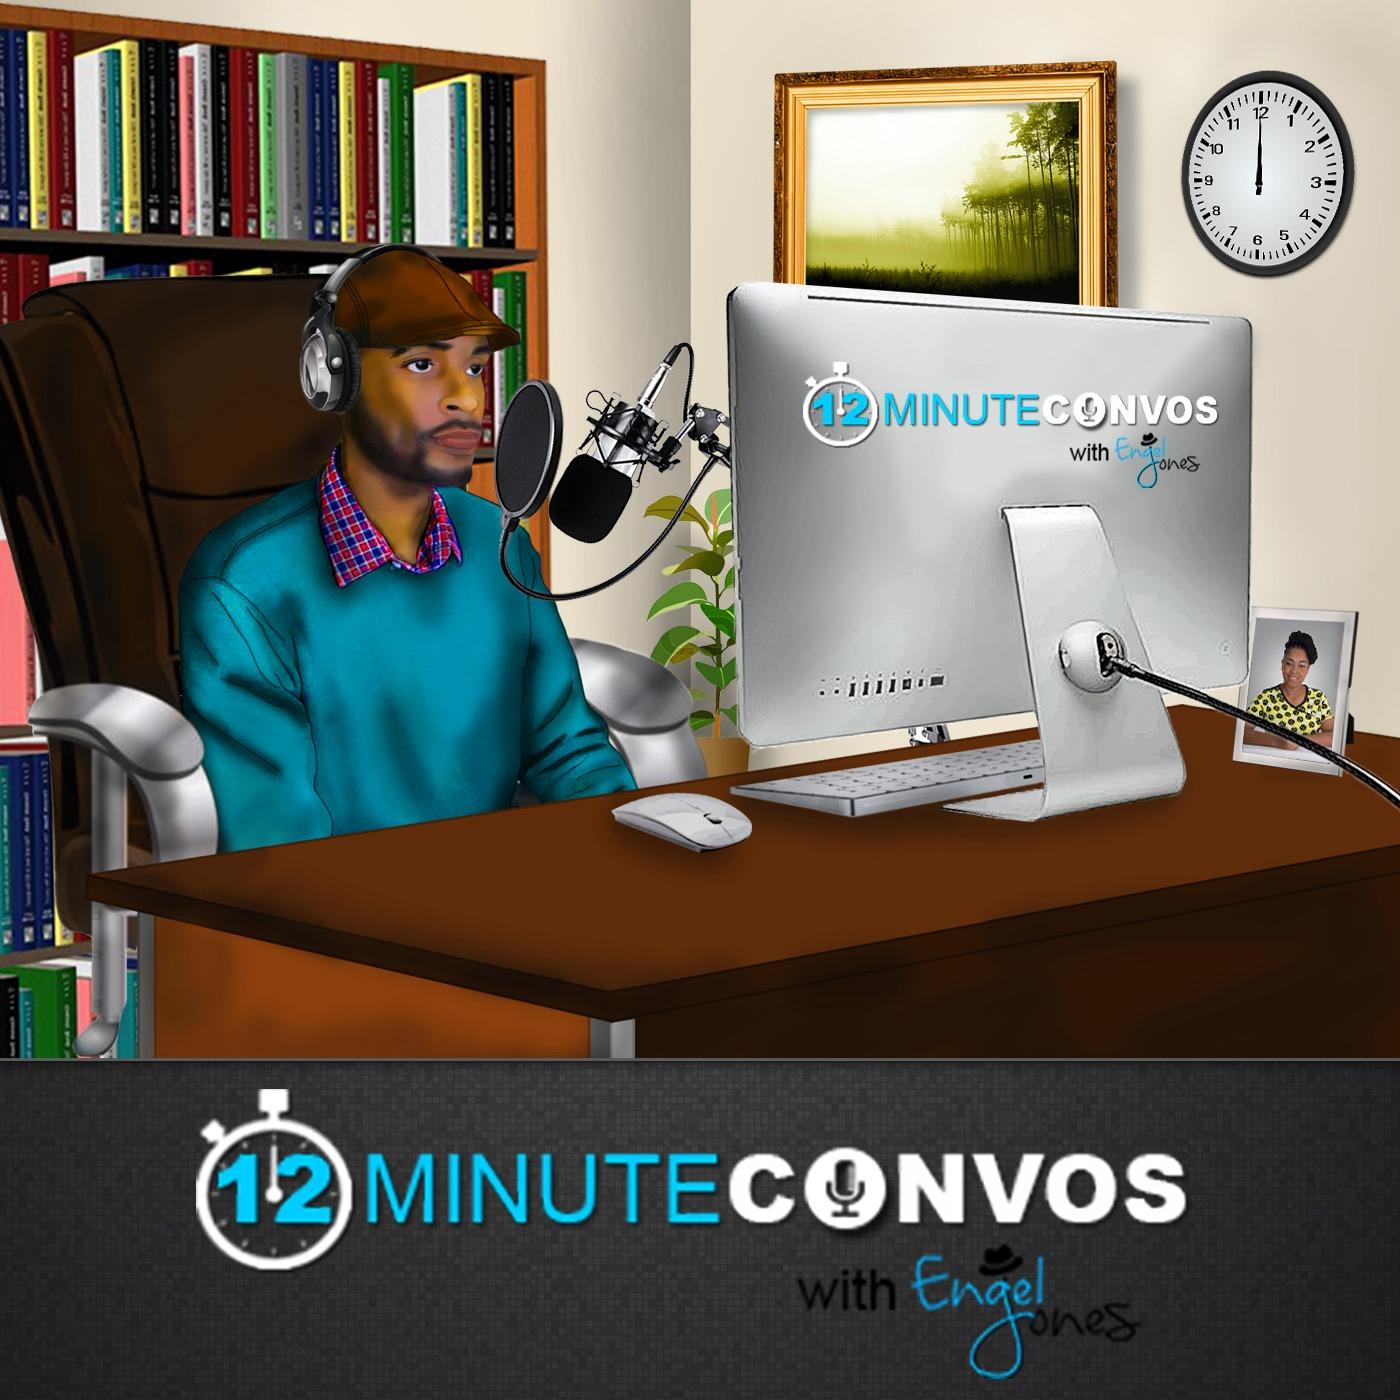 Twelve Minute Convos Logo